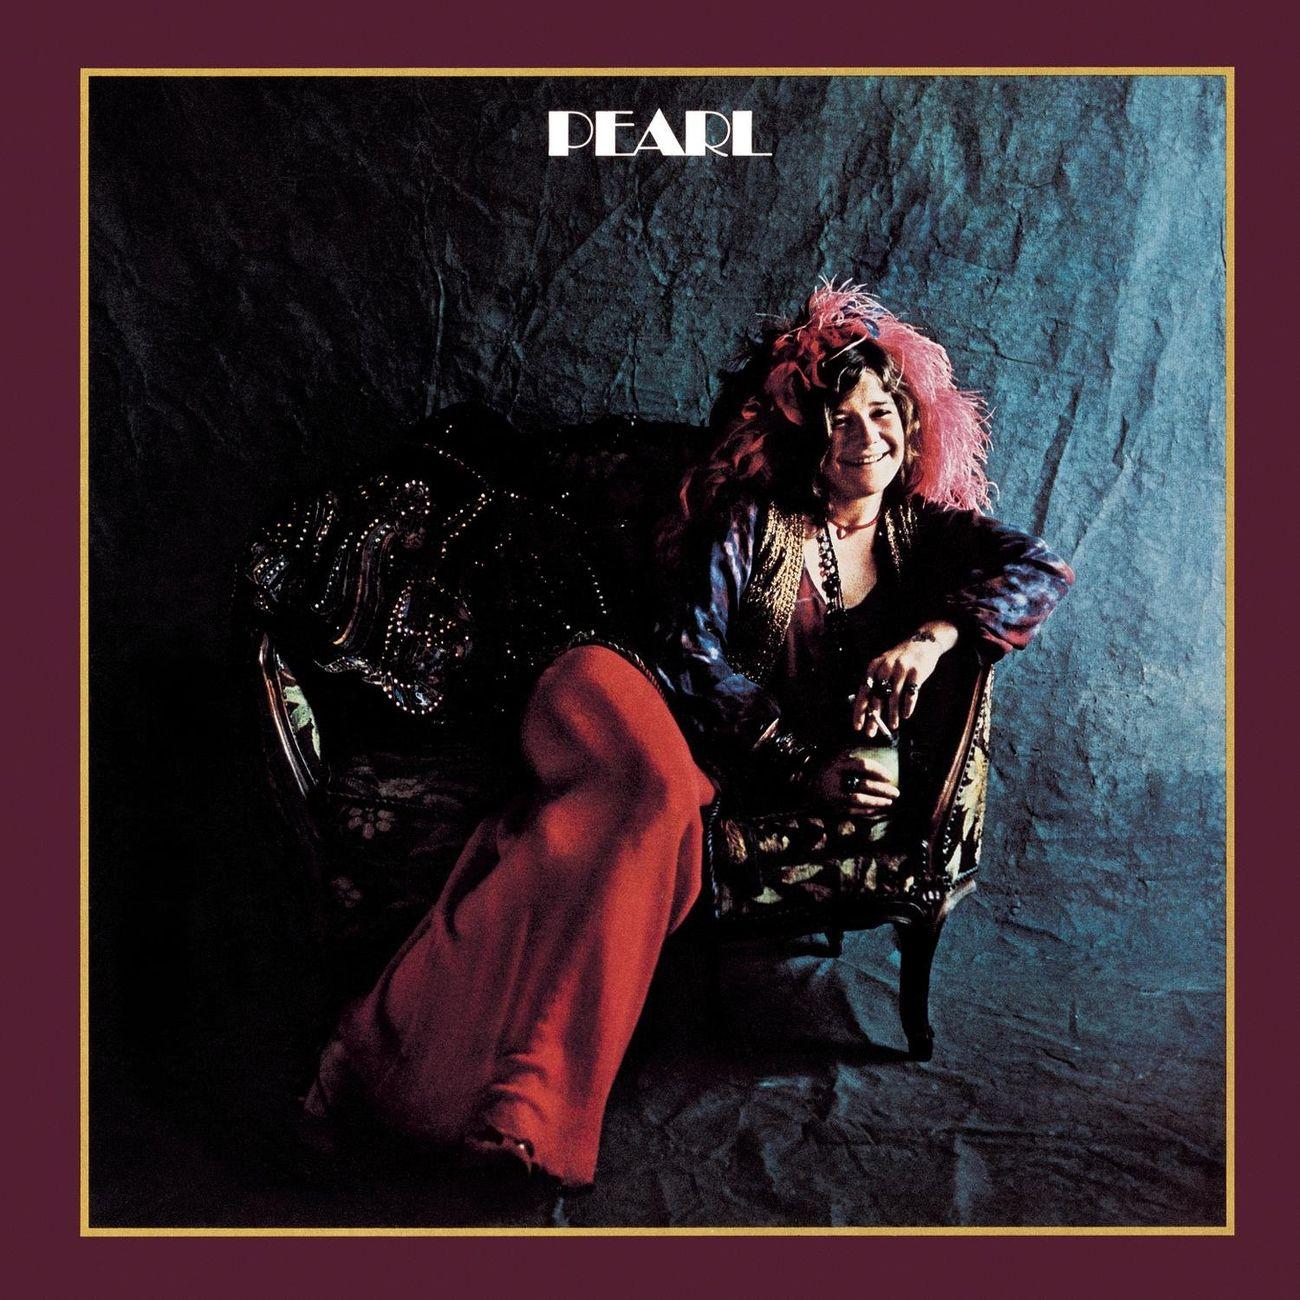 La copertina di Pearl (1971) di Janis Joplin